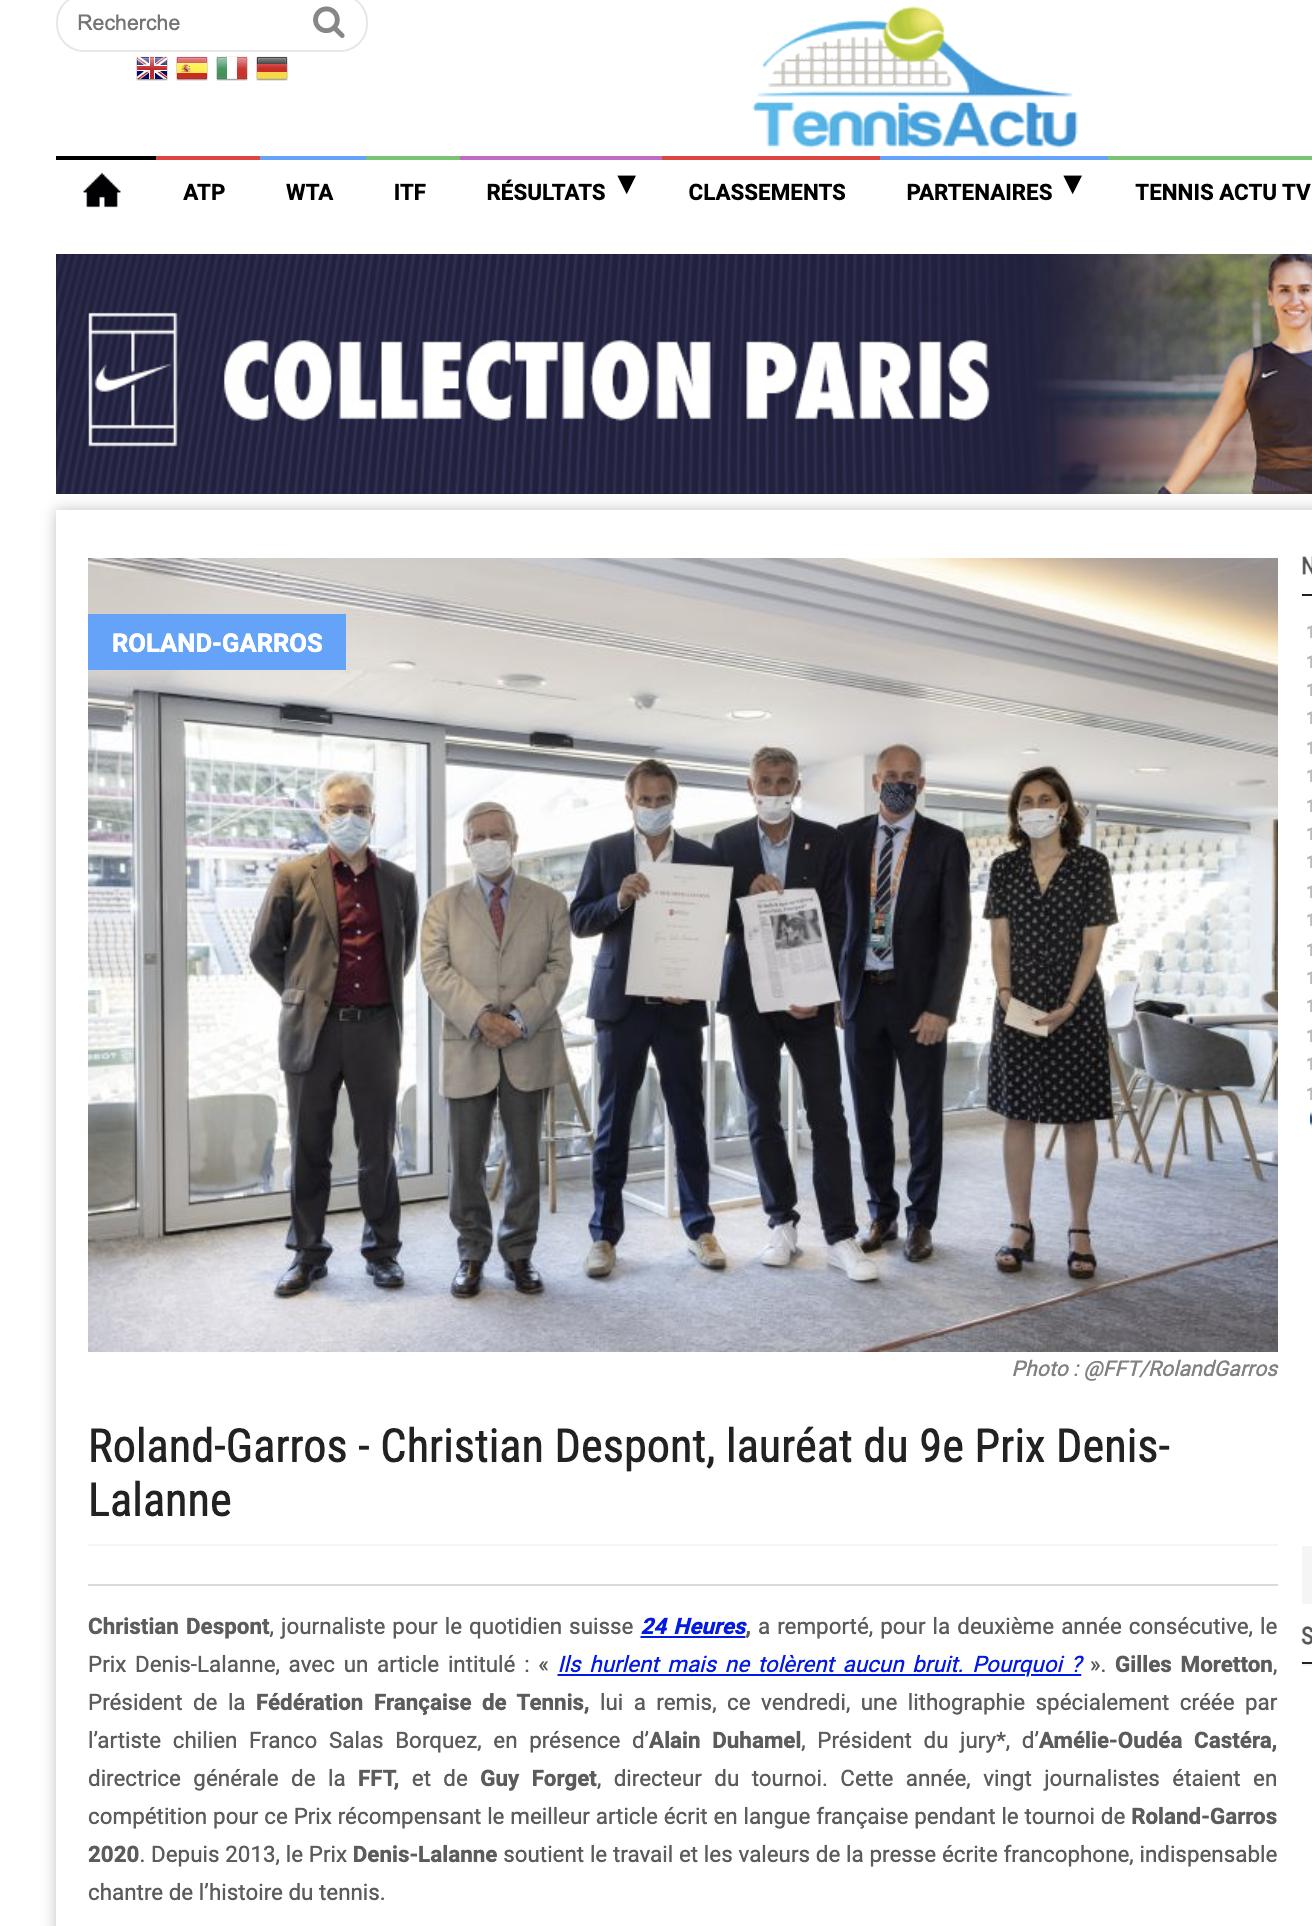 Tennis Actu - 9e Prix Denis-Lalanne